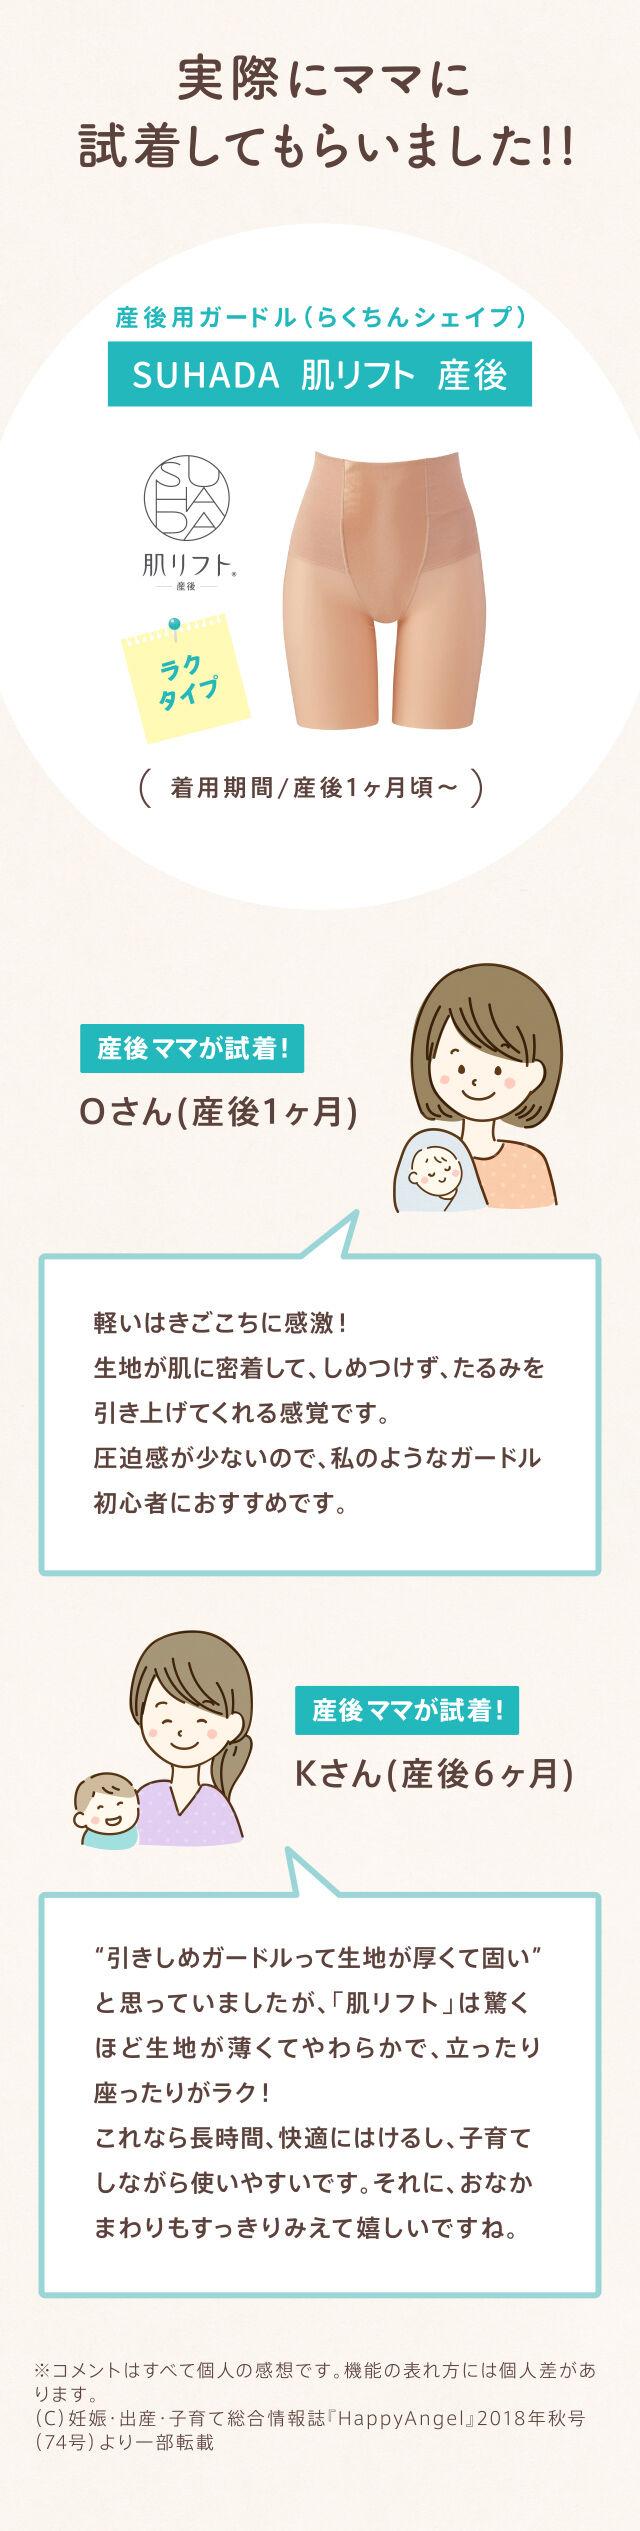 SUHADA 肌リフト 産後